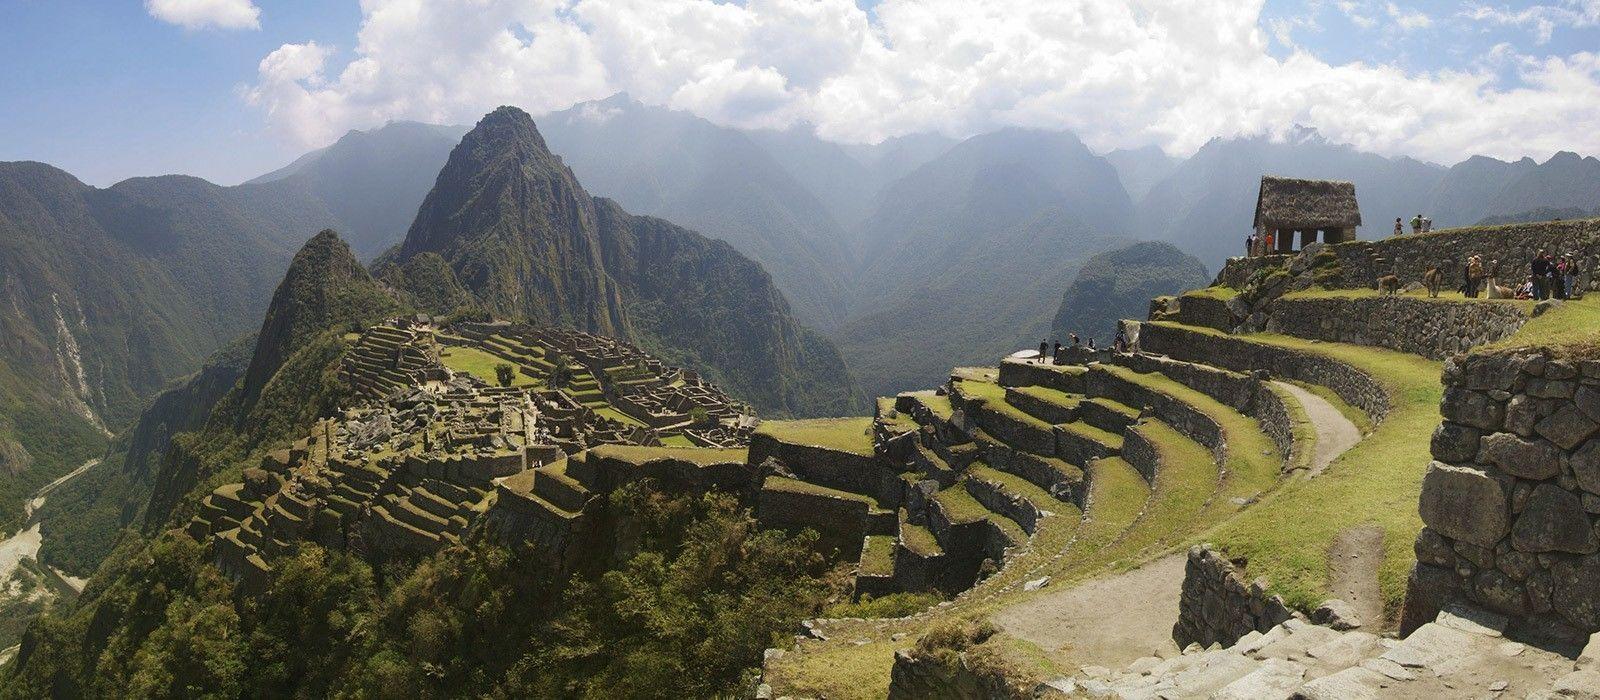 South America: Top 5 Travel Treats Tour Trip 4